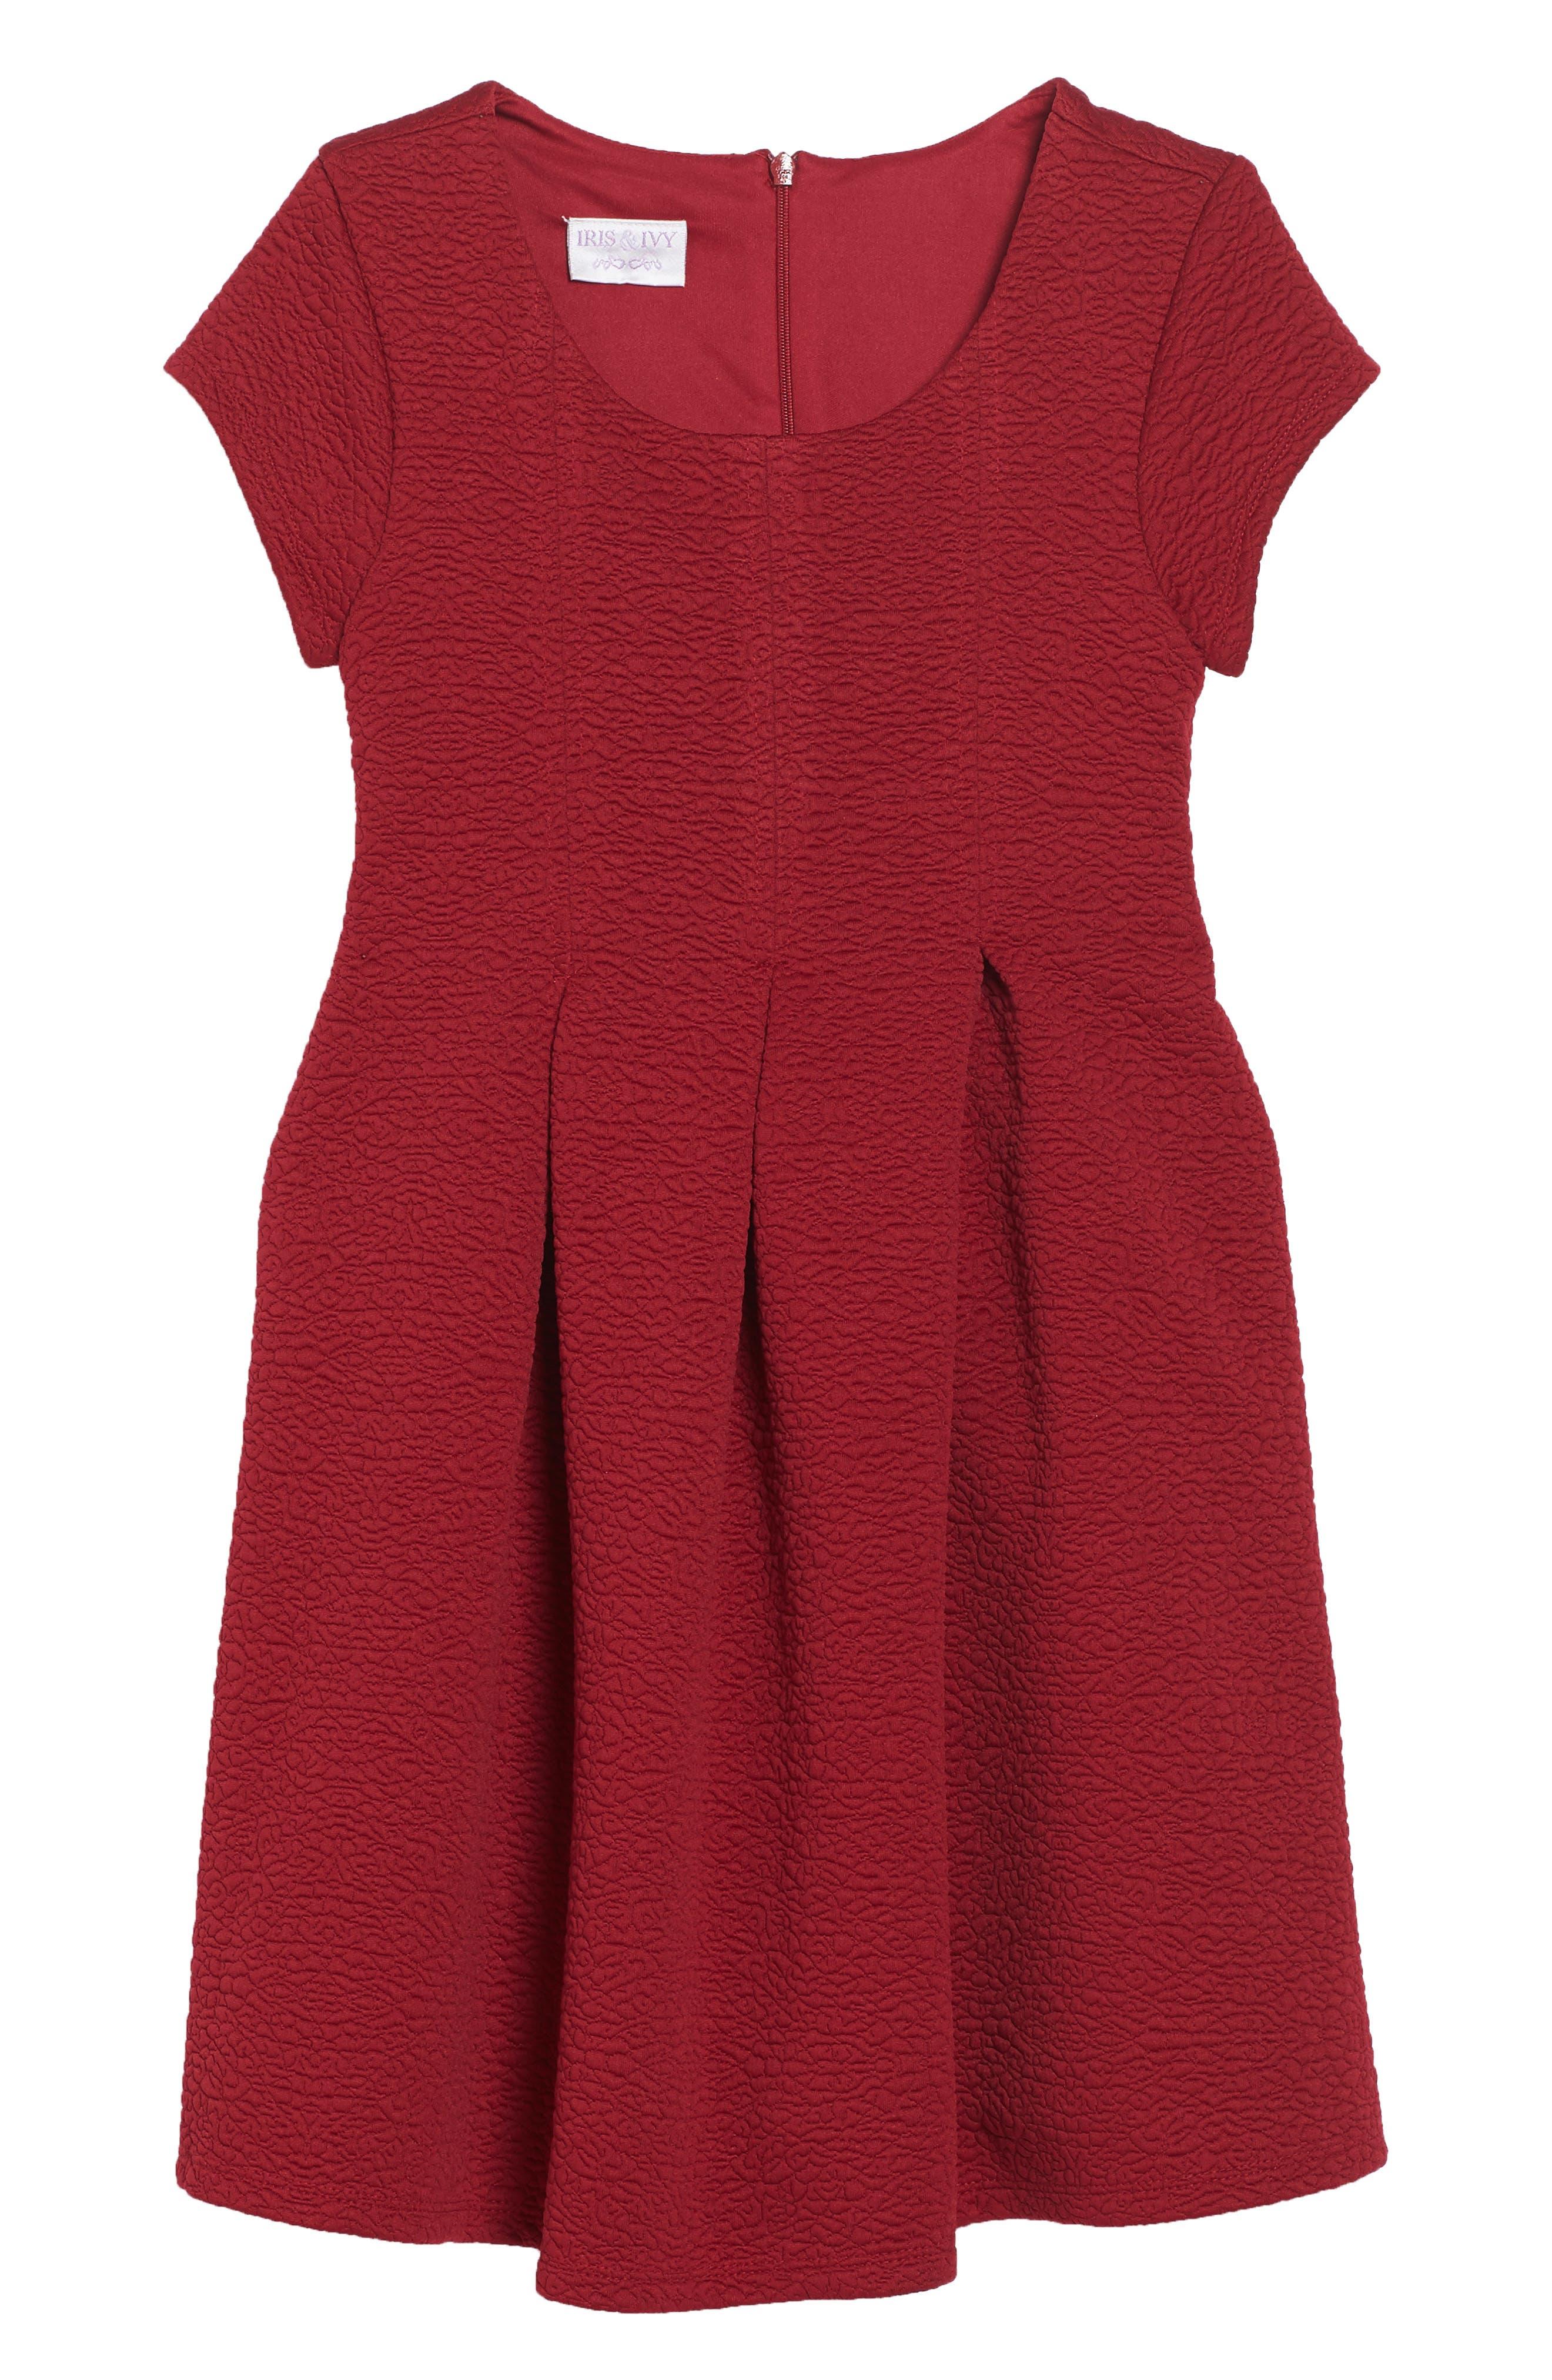 Alternate Image 1 Selected - Iris & Ivy Textured Knit Dress (Toddler Girls, Little Girls & Big Girls)